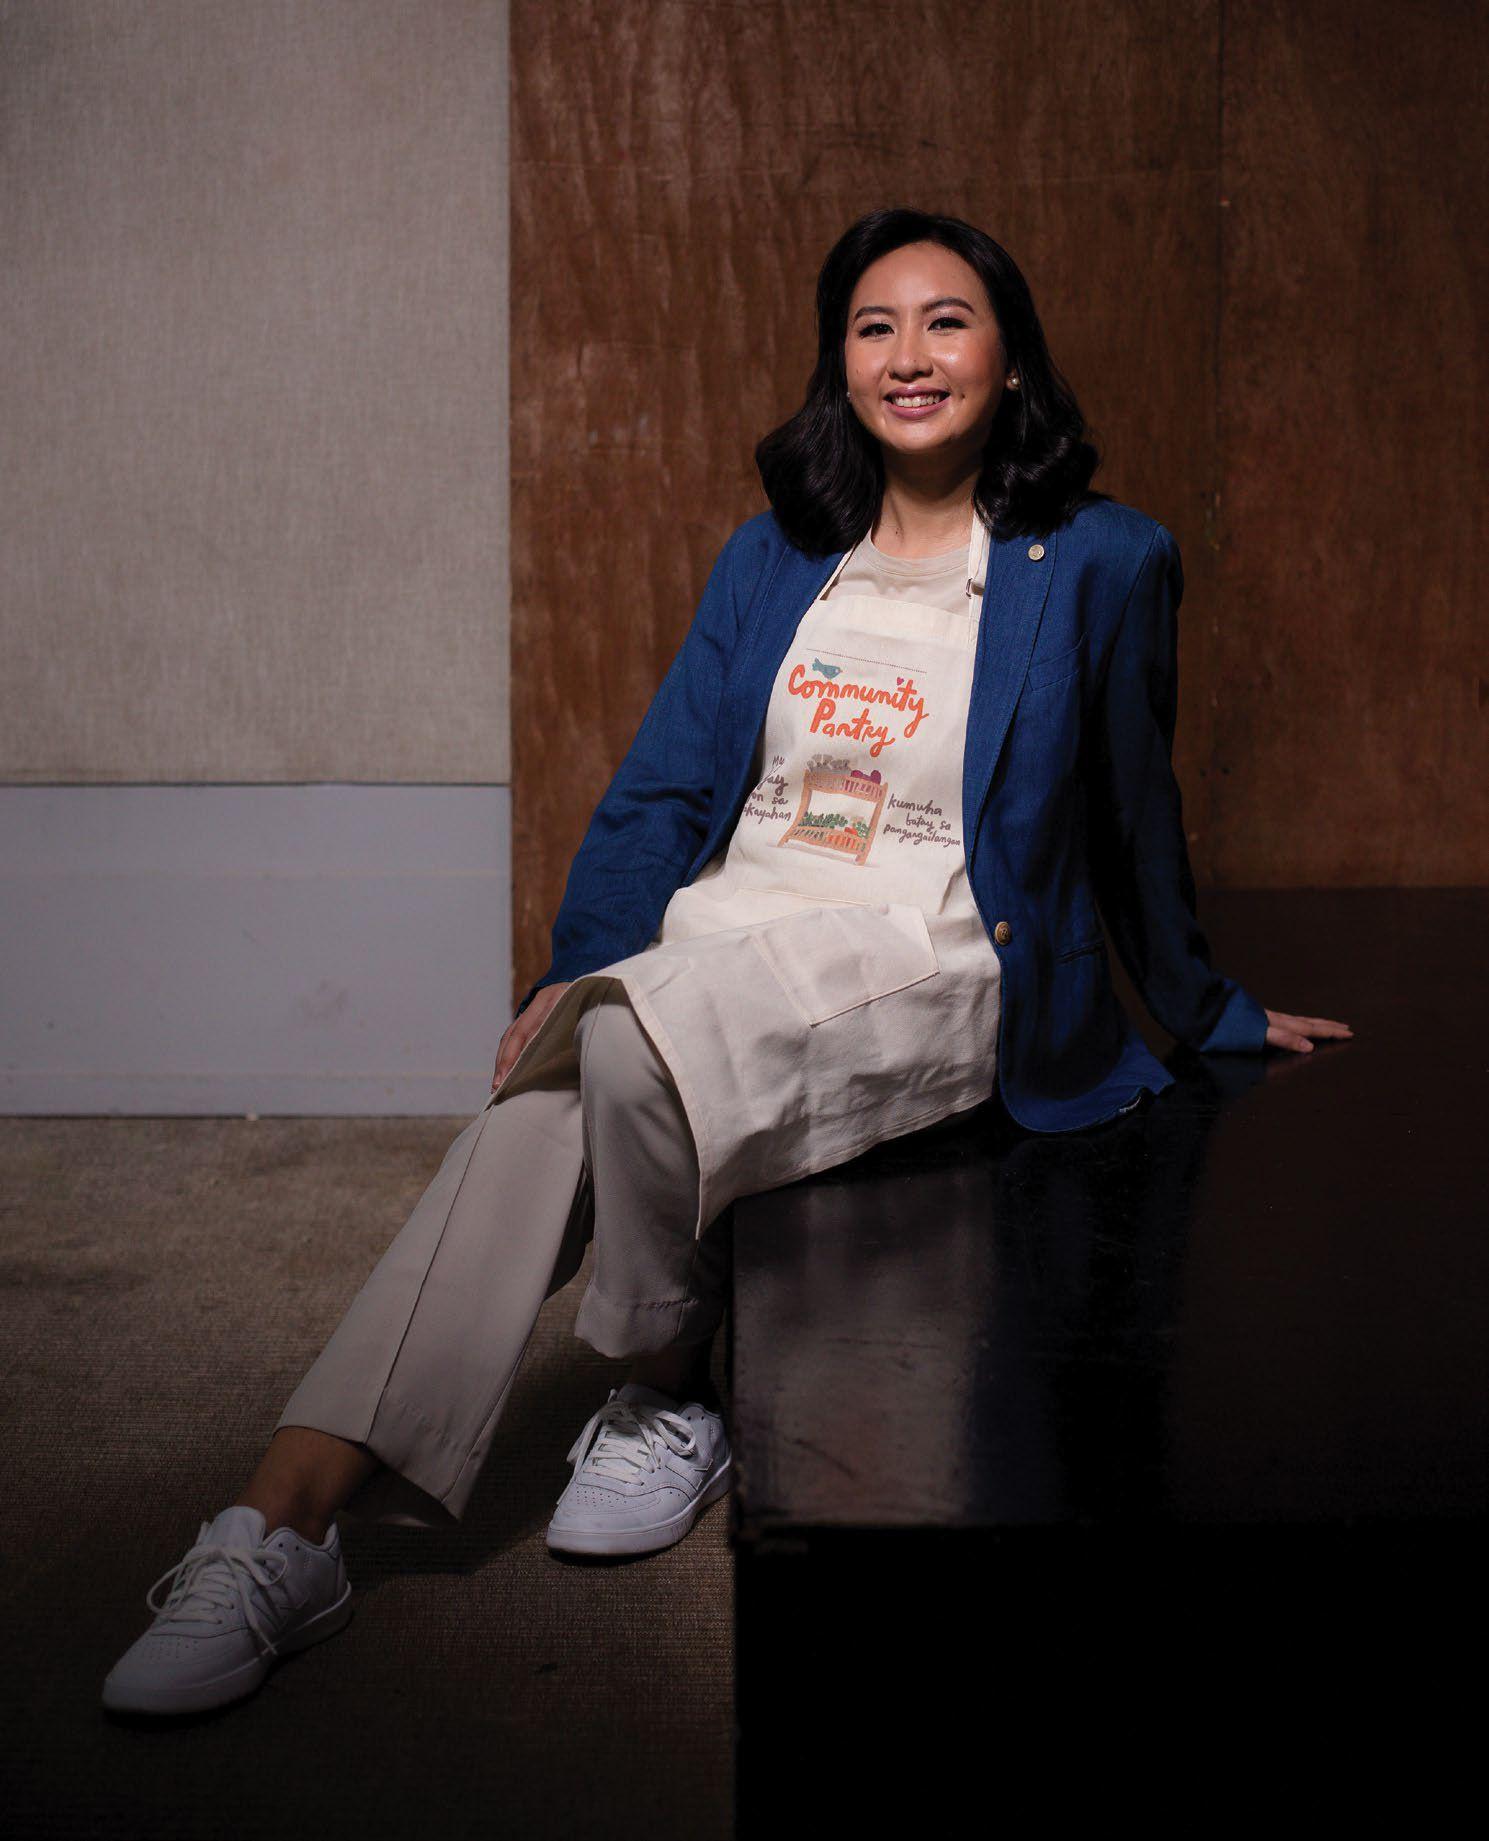 Ana Patricia Non Reveals The Community Pantry's True Purpose